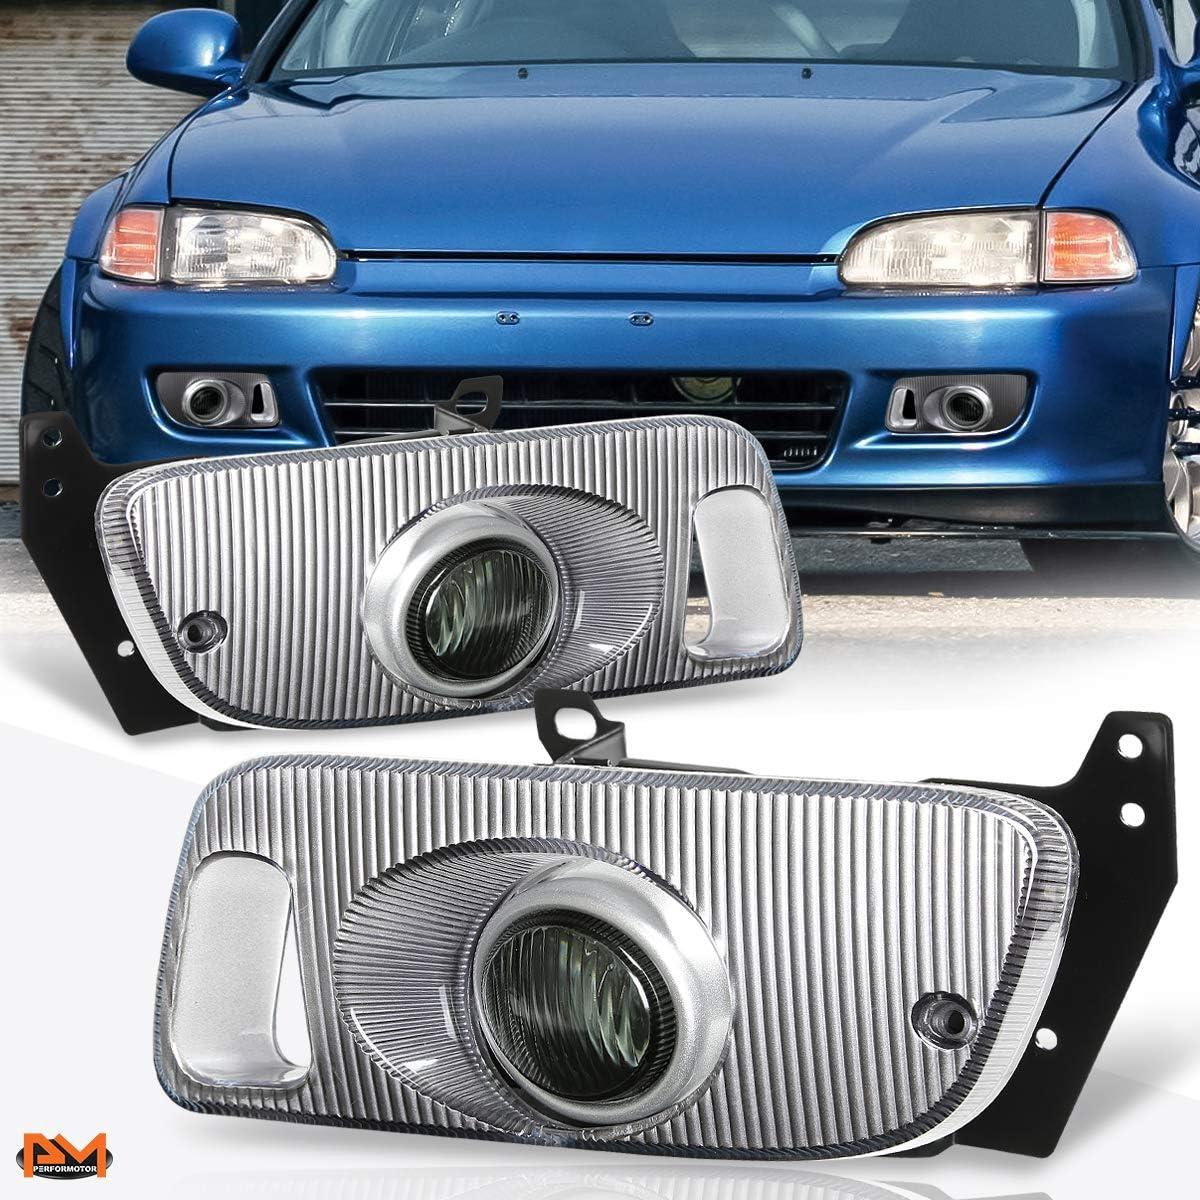 06-08 For Honda Civic Yellow Lens Pair Bumper Fog Light Lamp+Wiring+Switch Kit